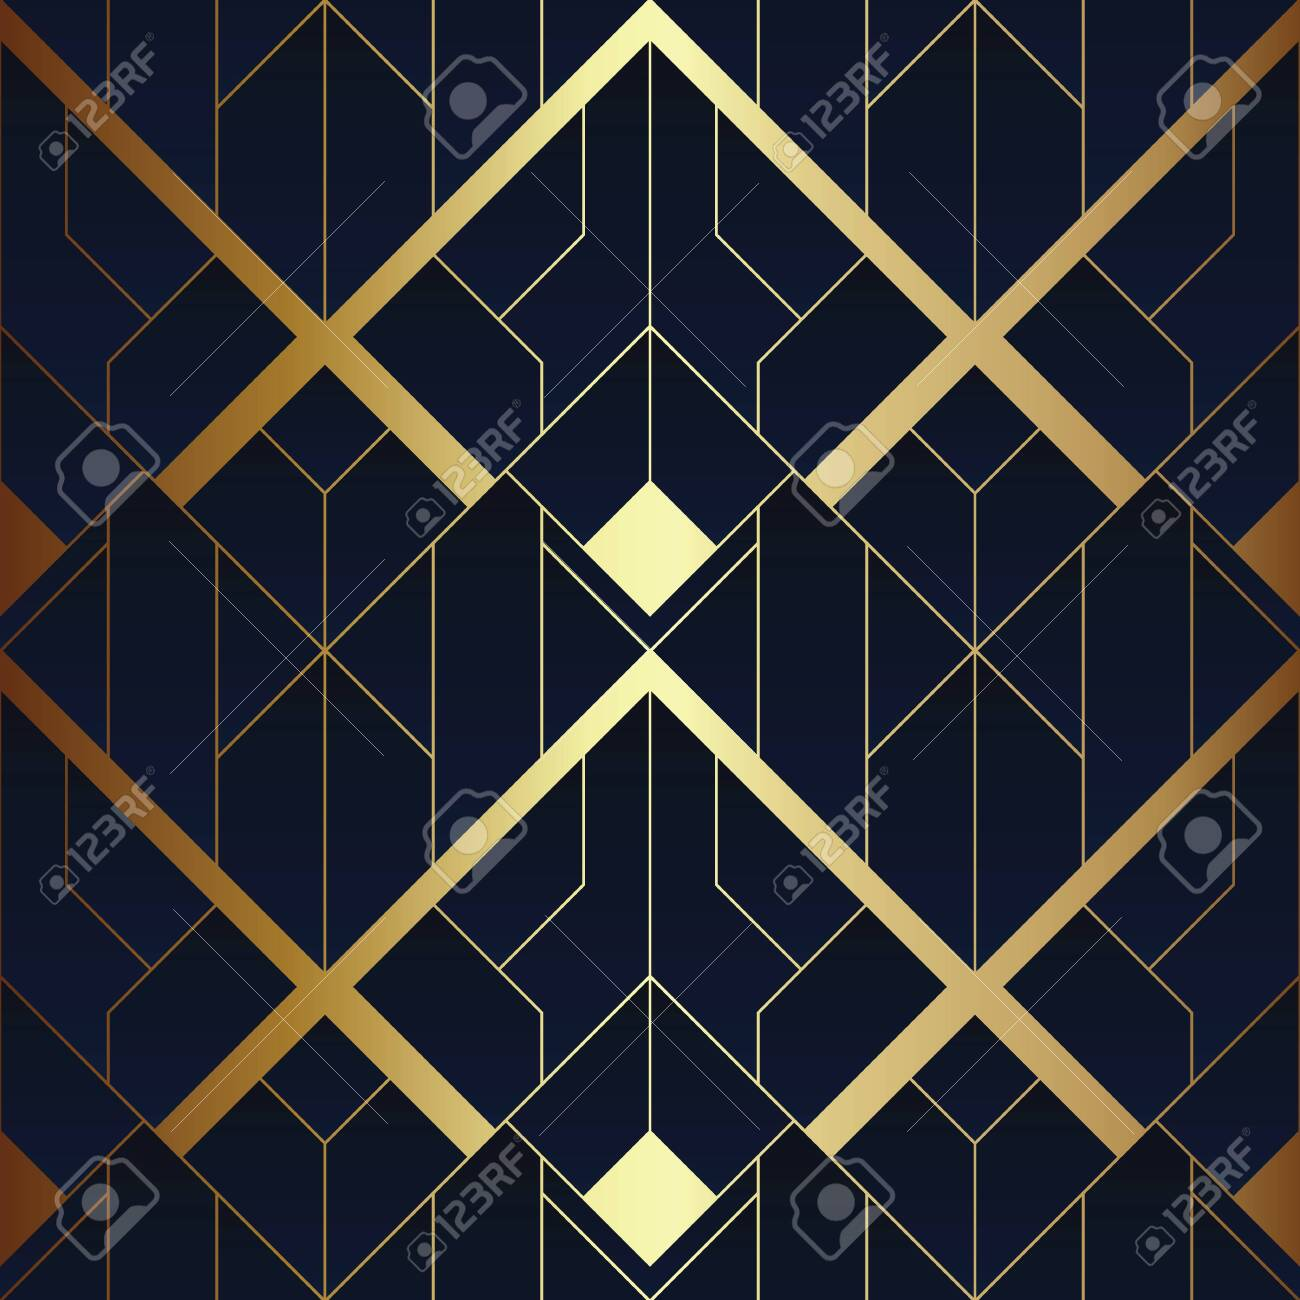 vector modern geometric tiles pattern luxury dark blue with